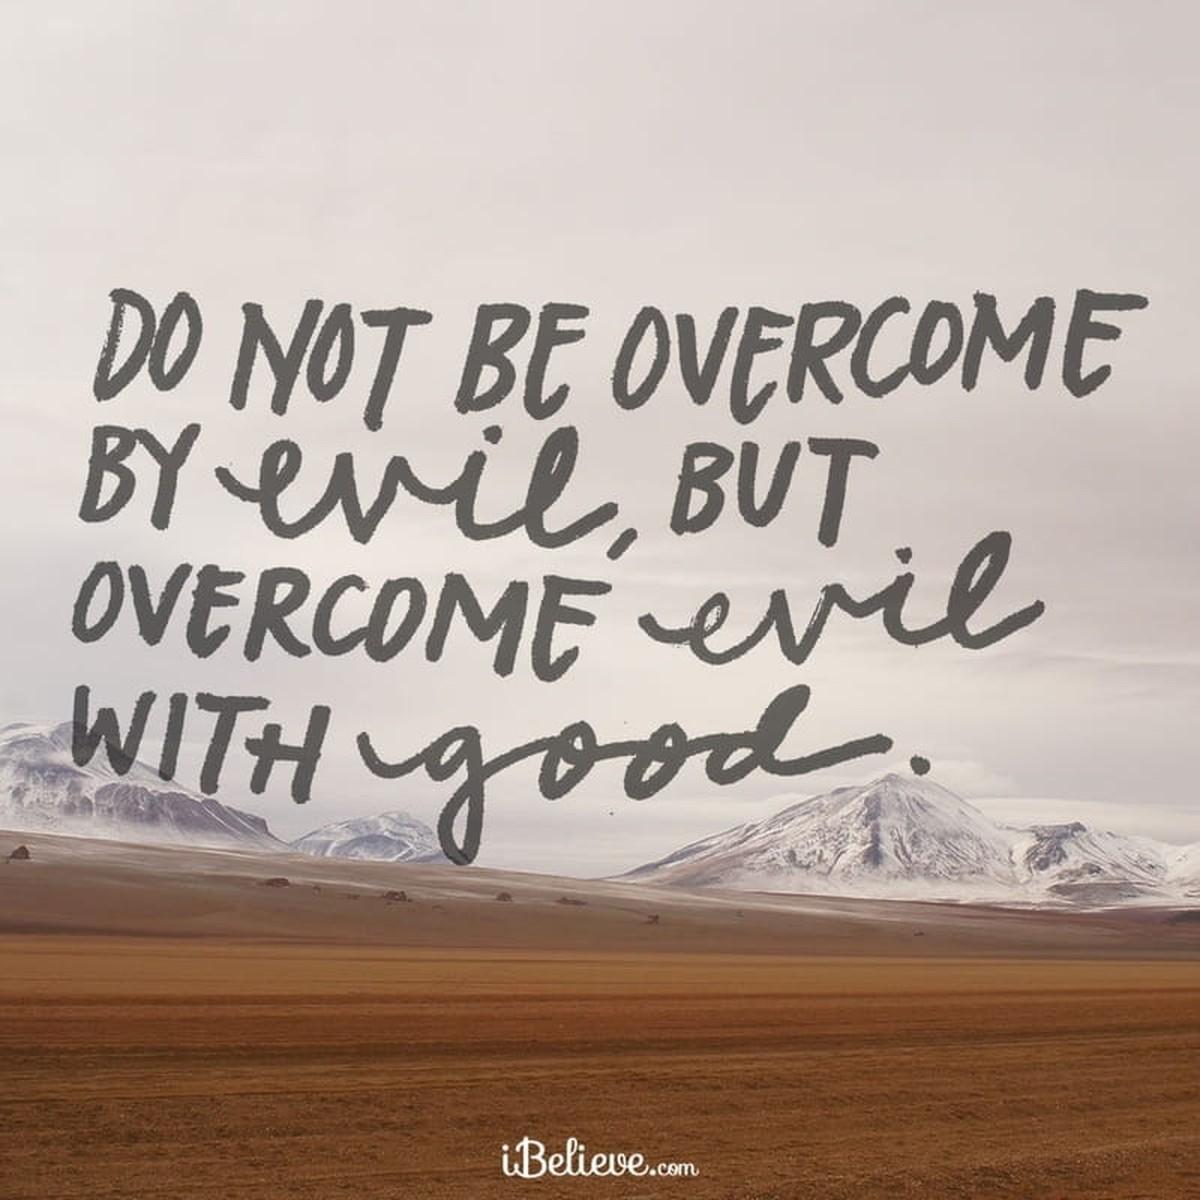 Bible Verses About Revenge